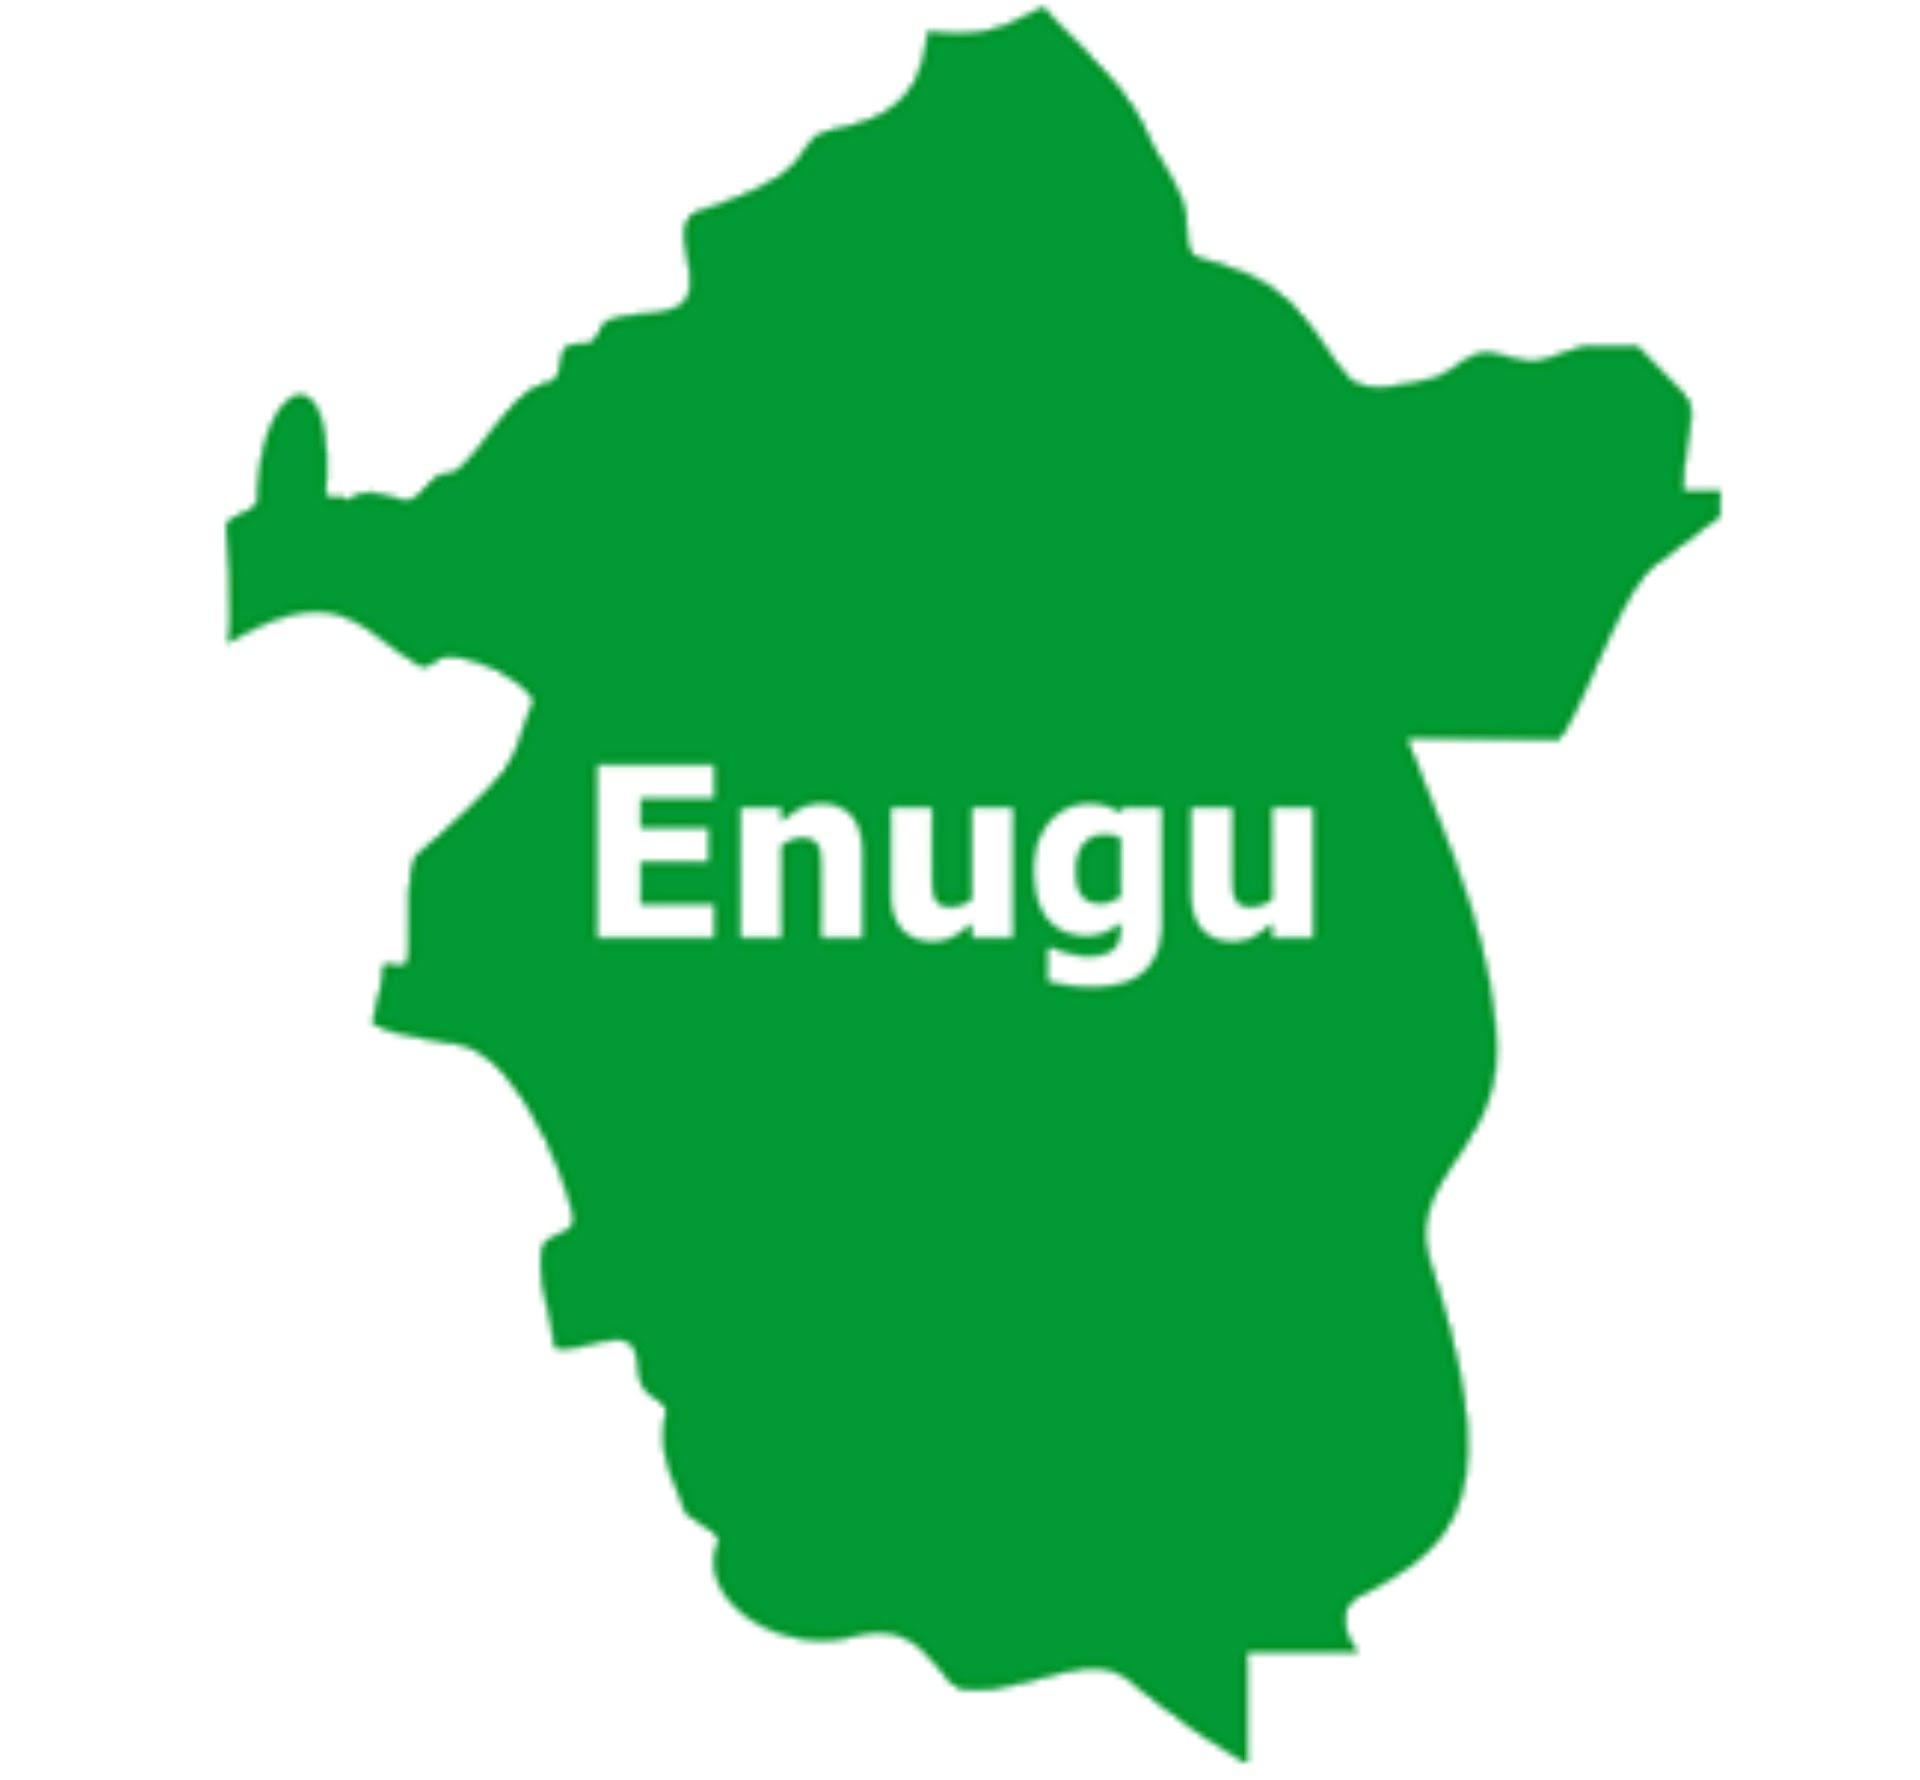 Enugu